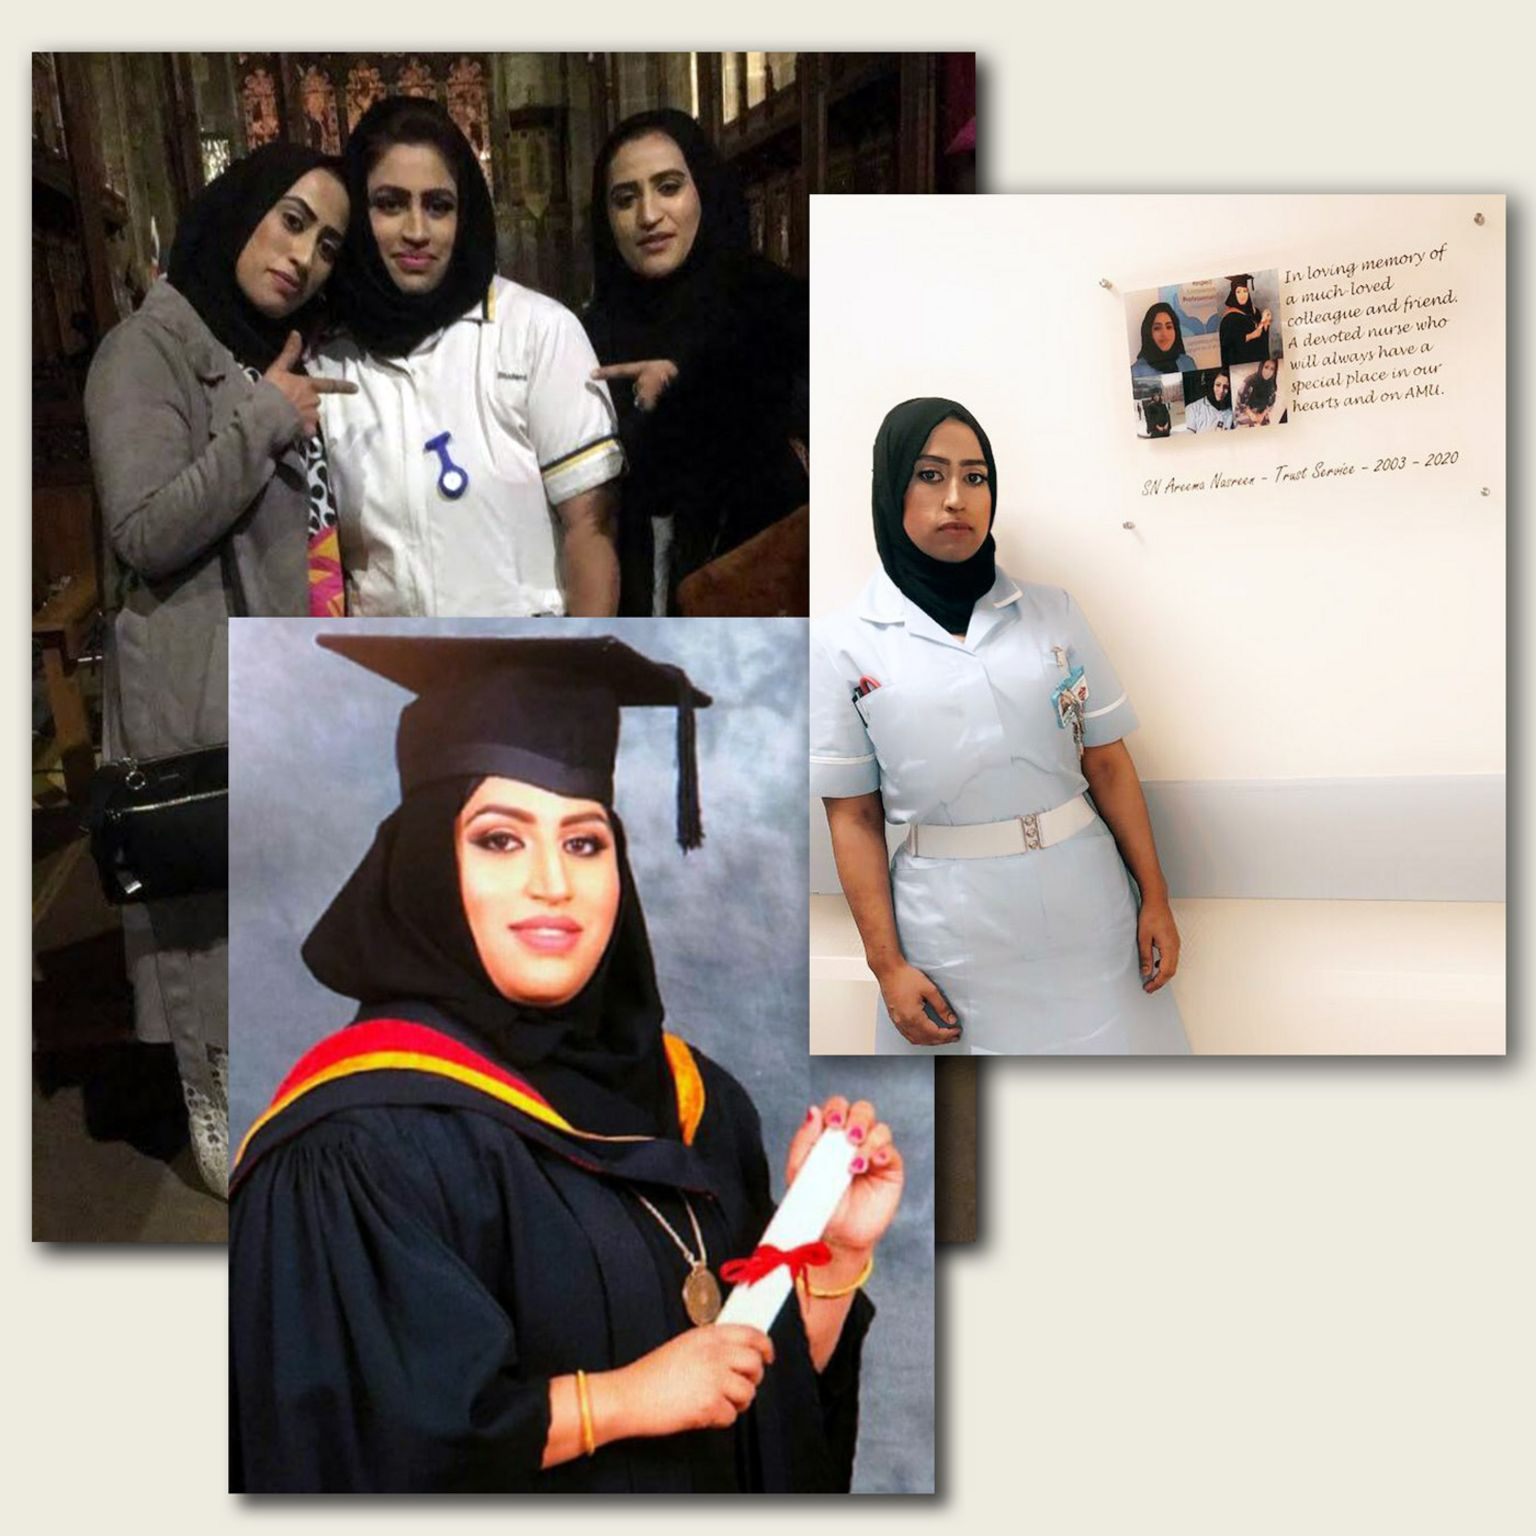 Areema Nasreen with her sisters and at graduation, and Kazeema Afzal (r)